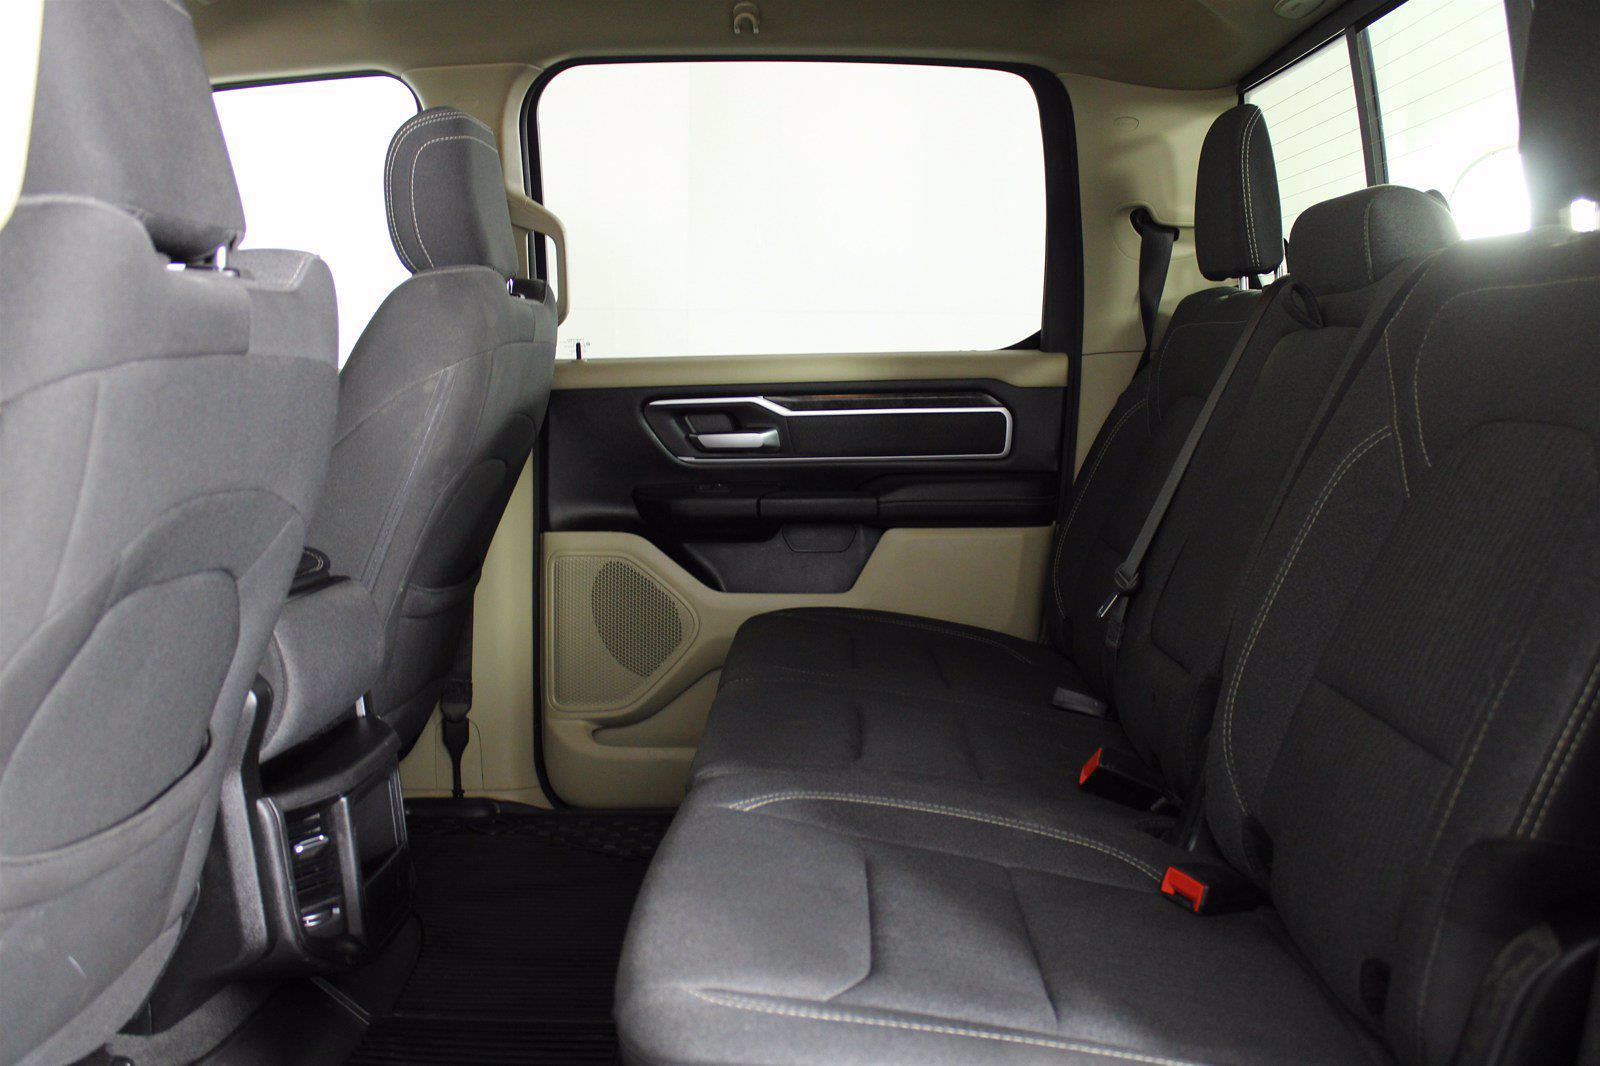 2020 Ram 1500 Crew Cab 4x4, Pickup #DAG0014 - photo 8